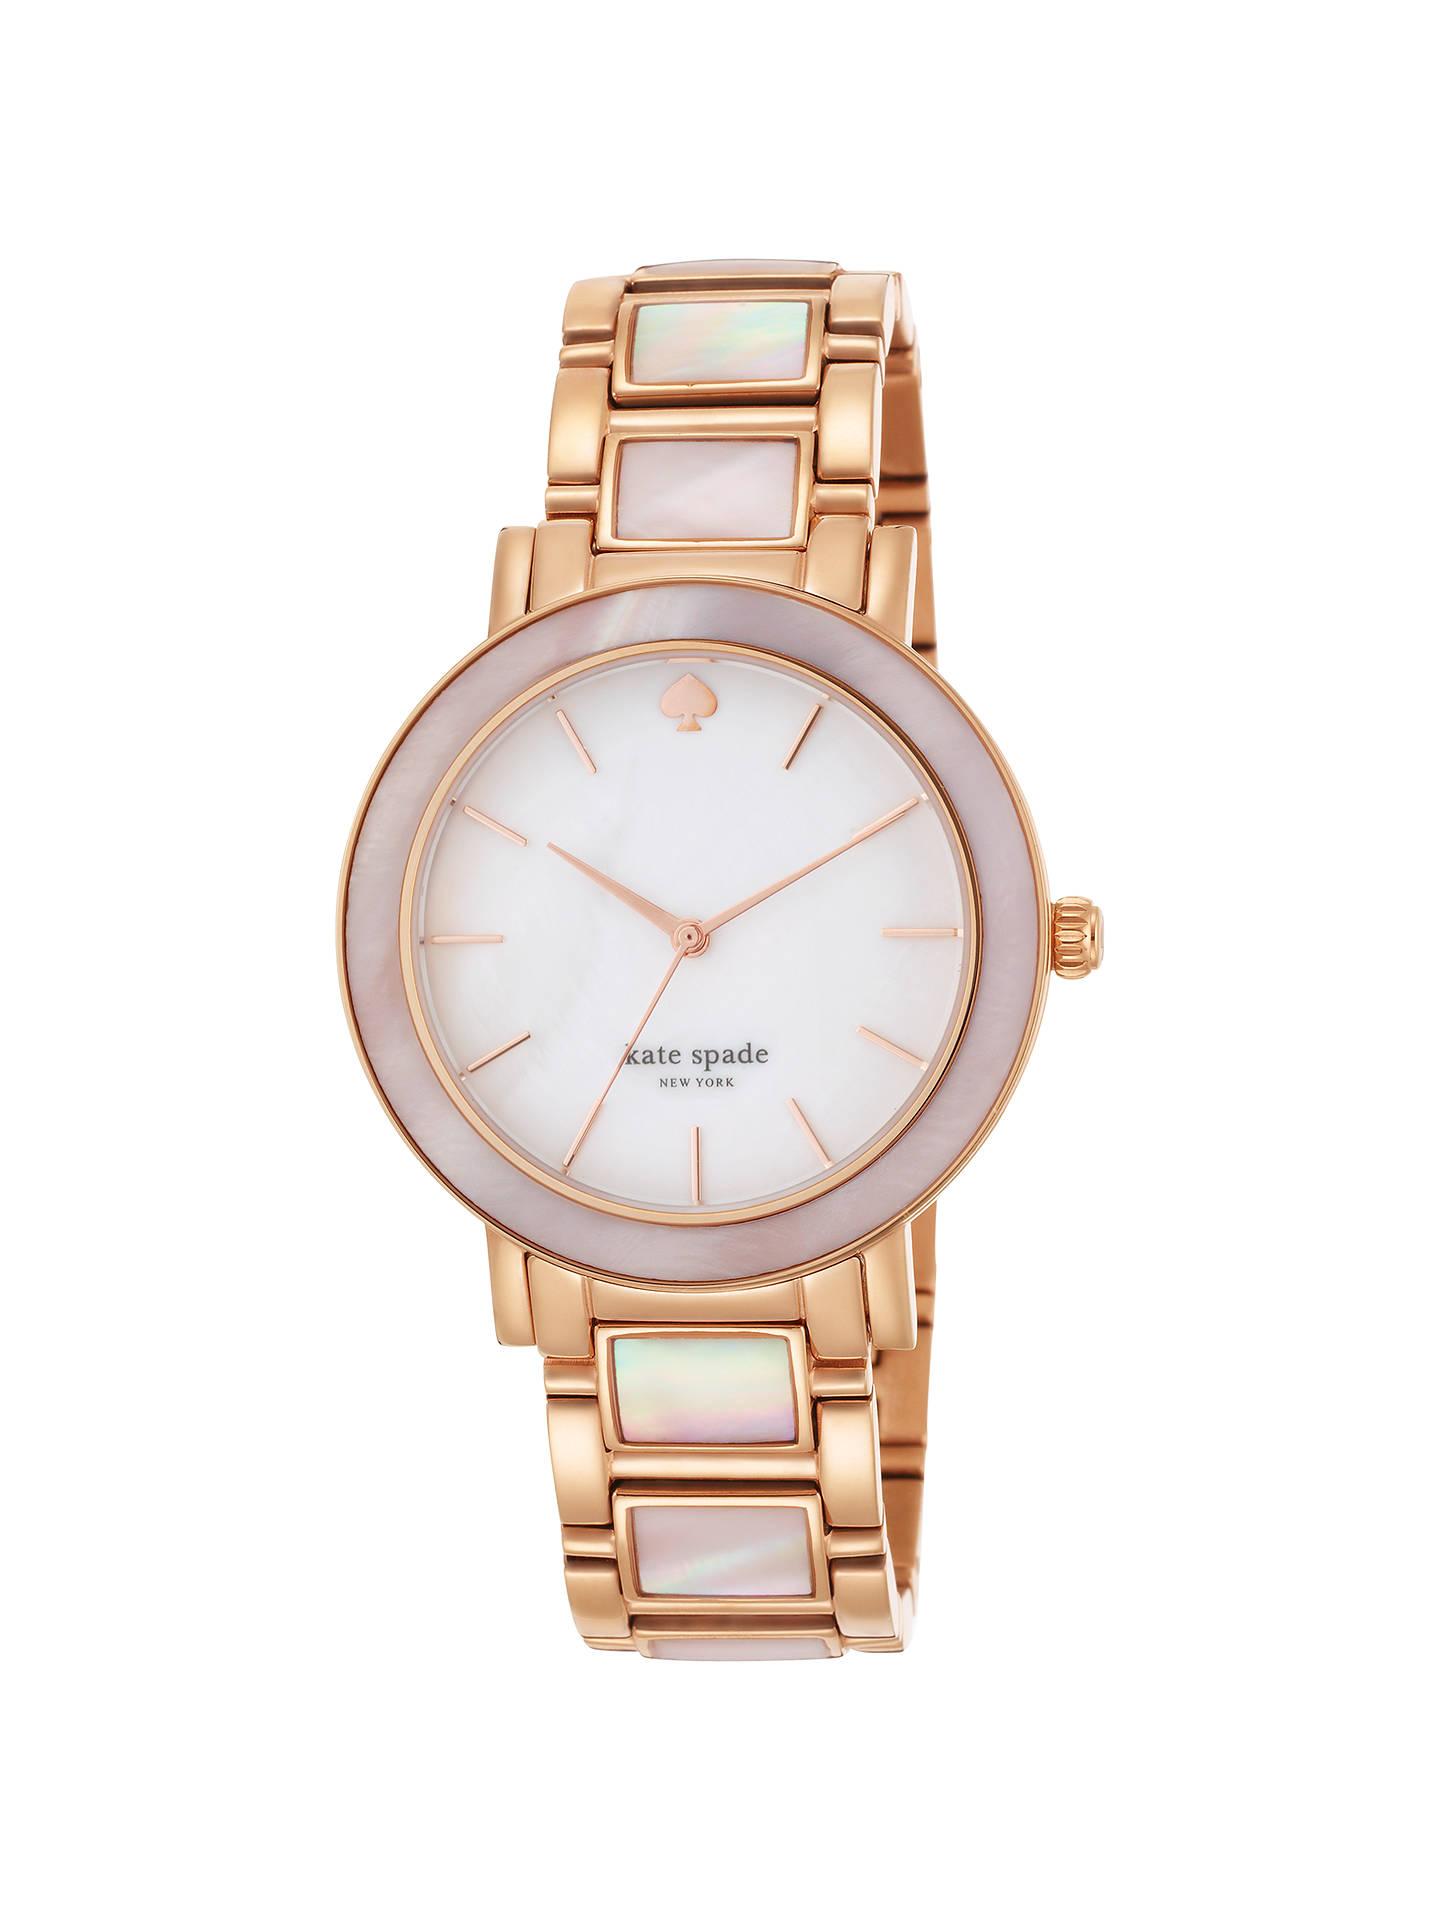 Kate Spade New York 1yru0396 Gramercy Grand Bracelet Strap Watch Rose Gold White Online